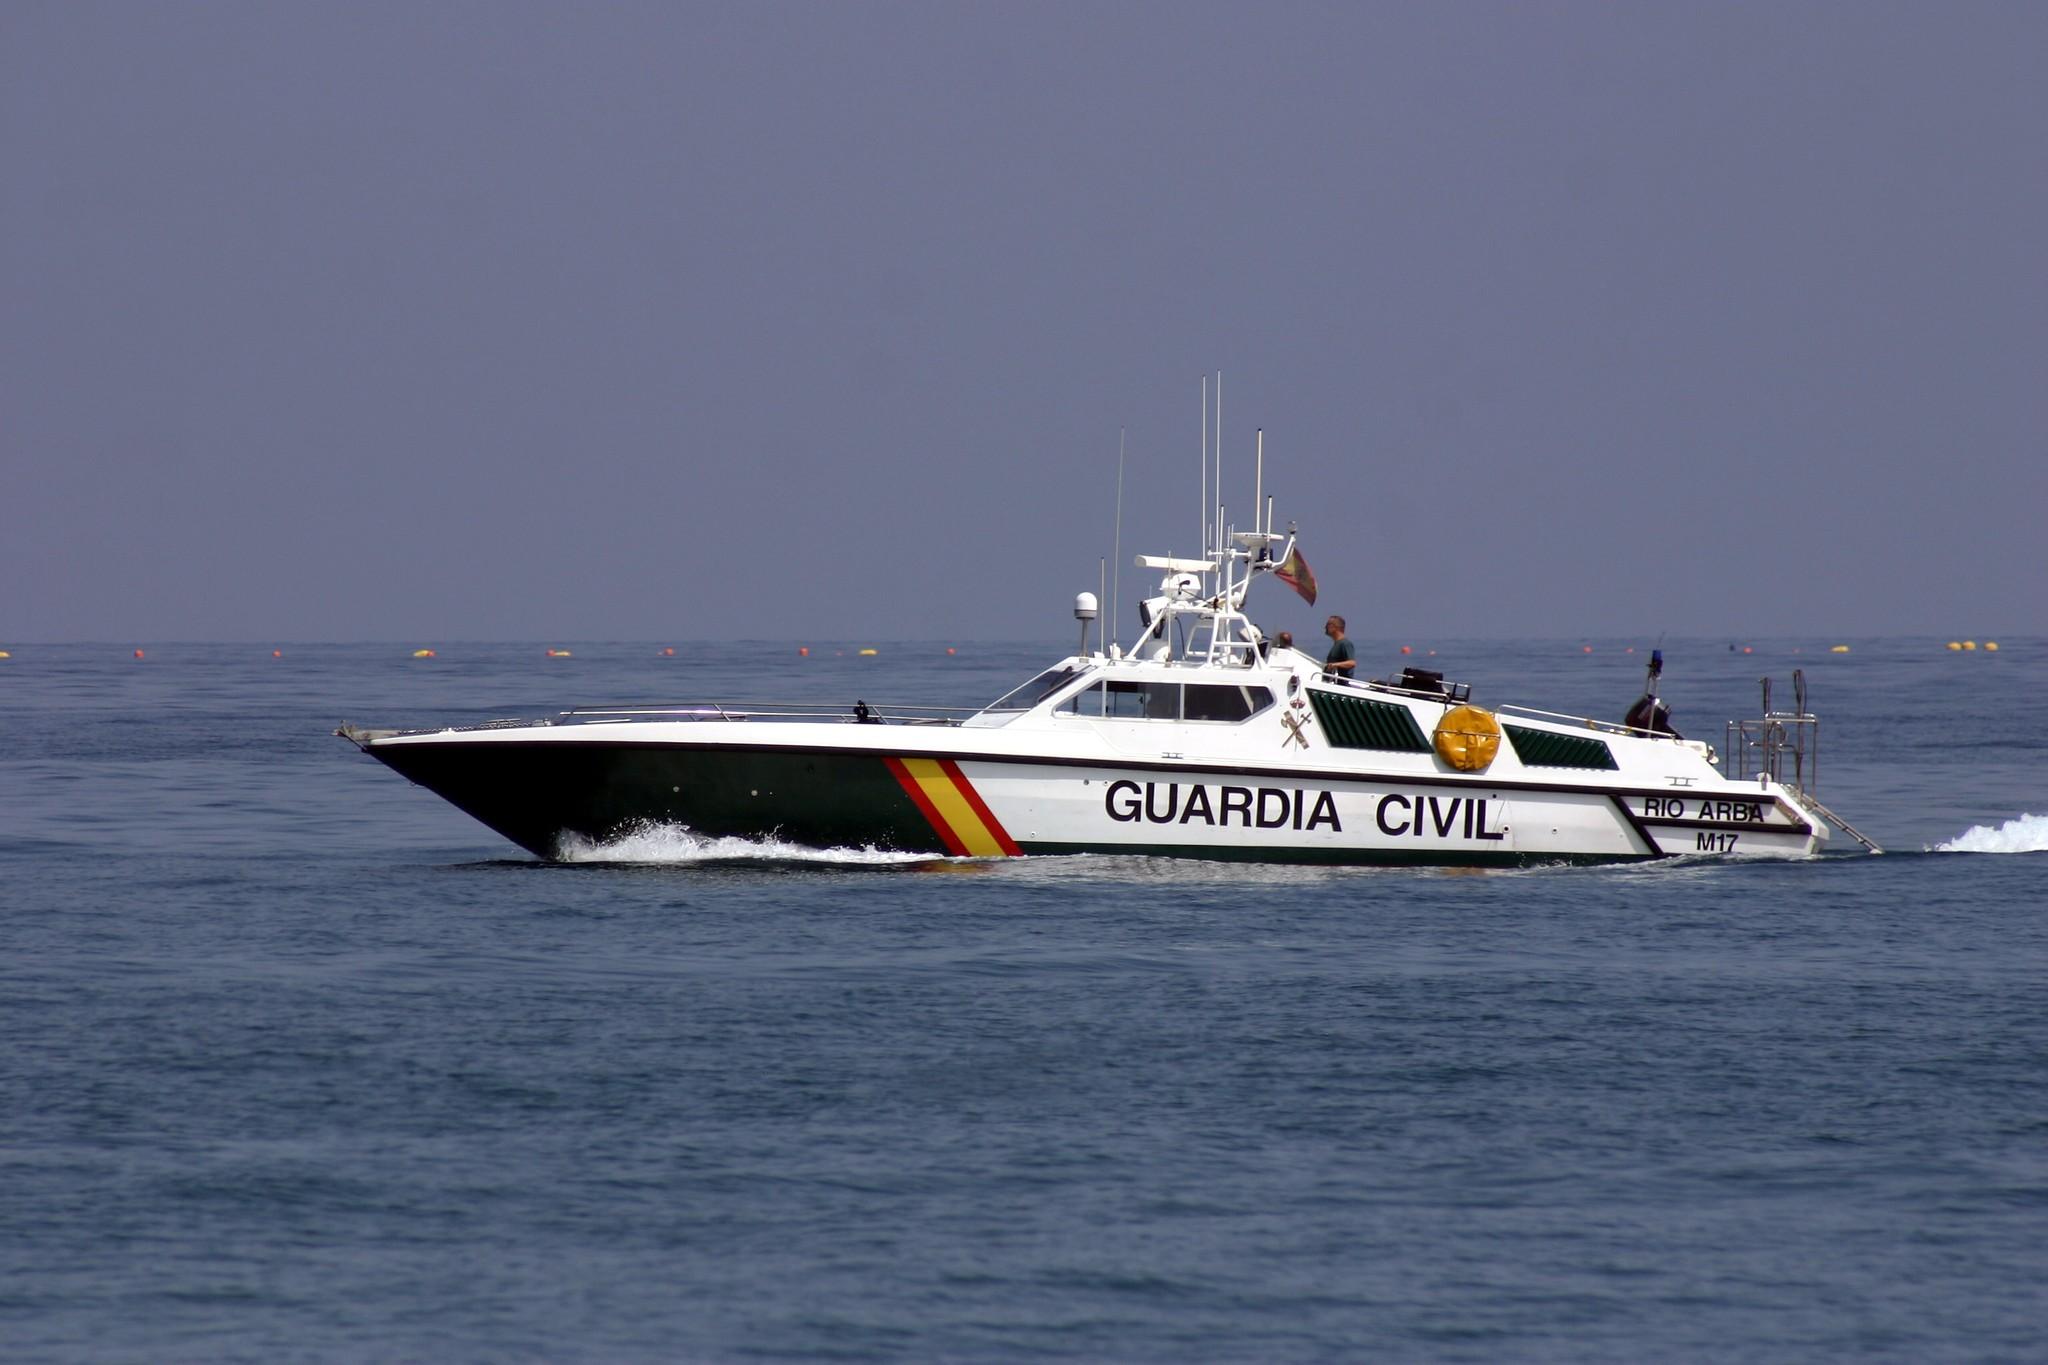 The Critical Communications Review - Spain's Guardia Civil